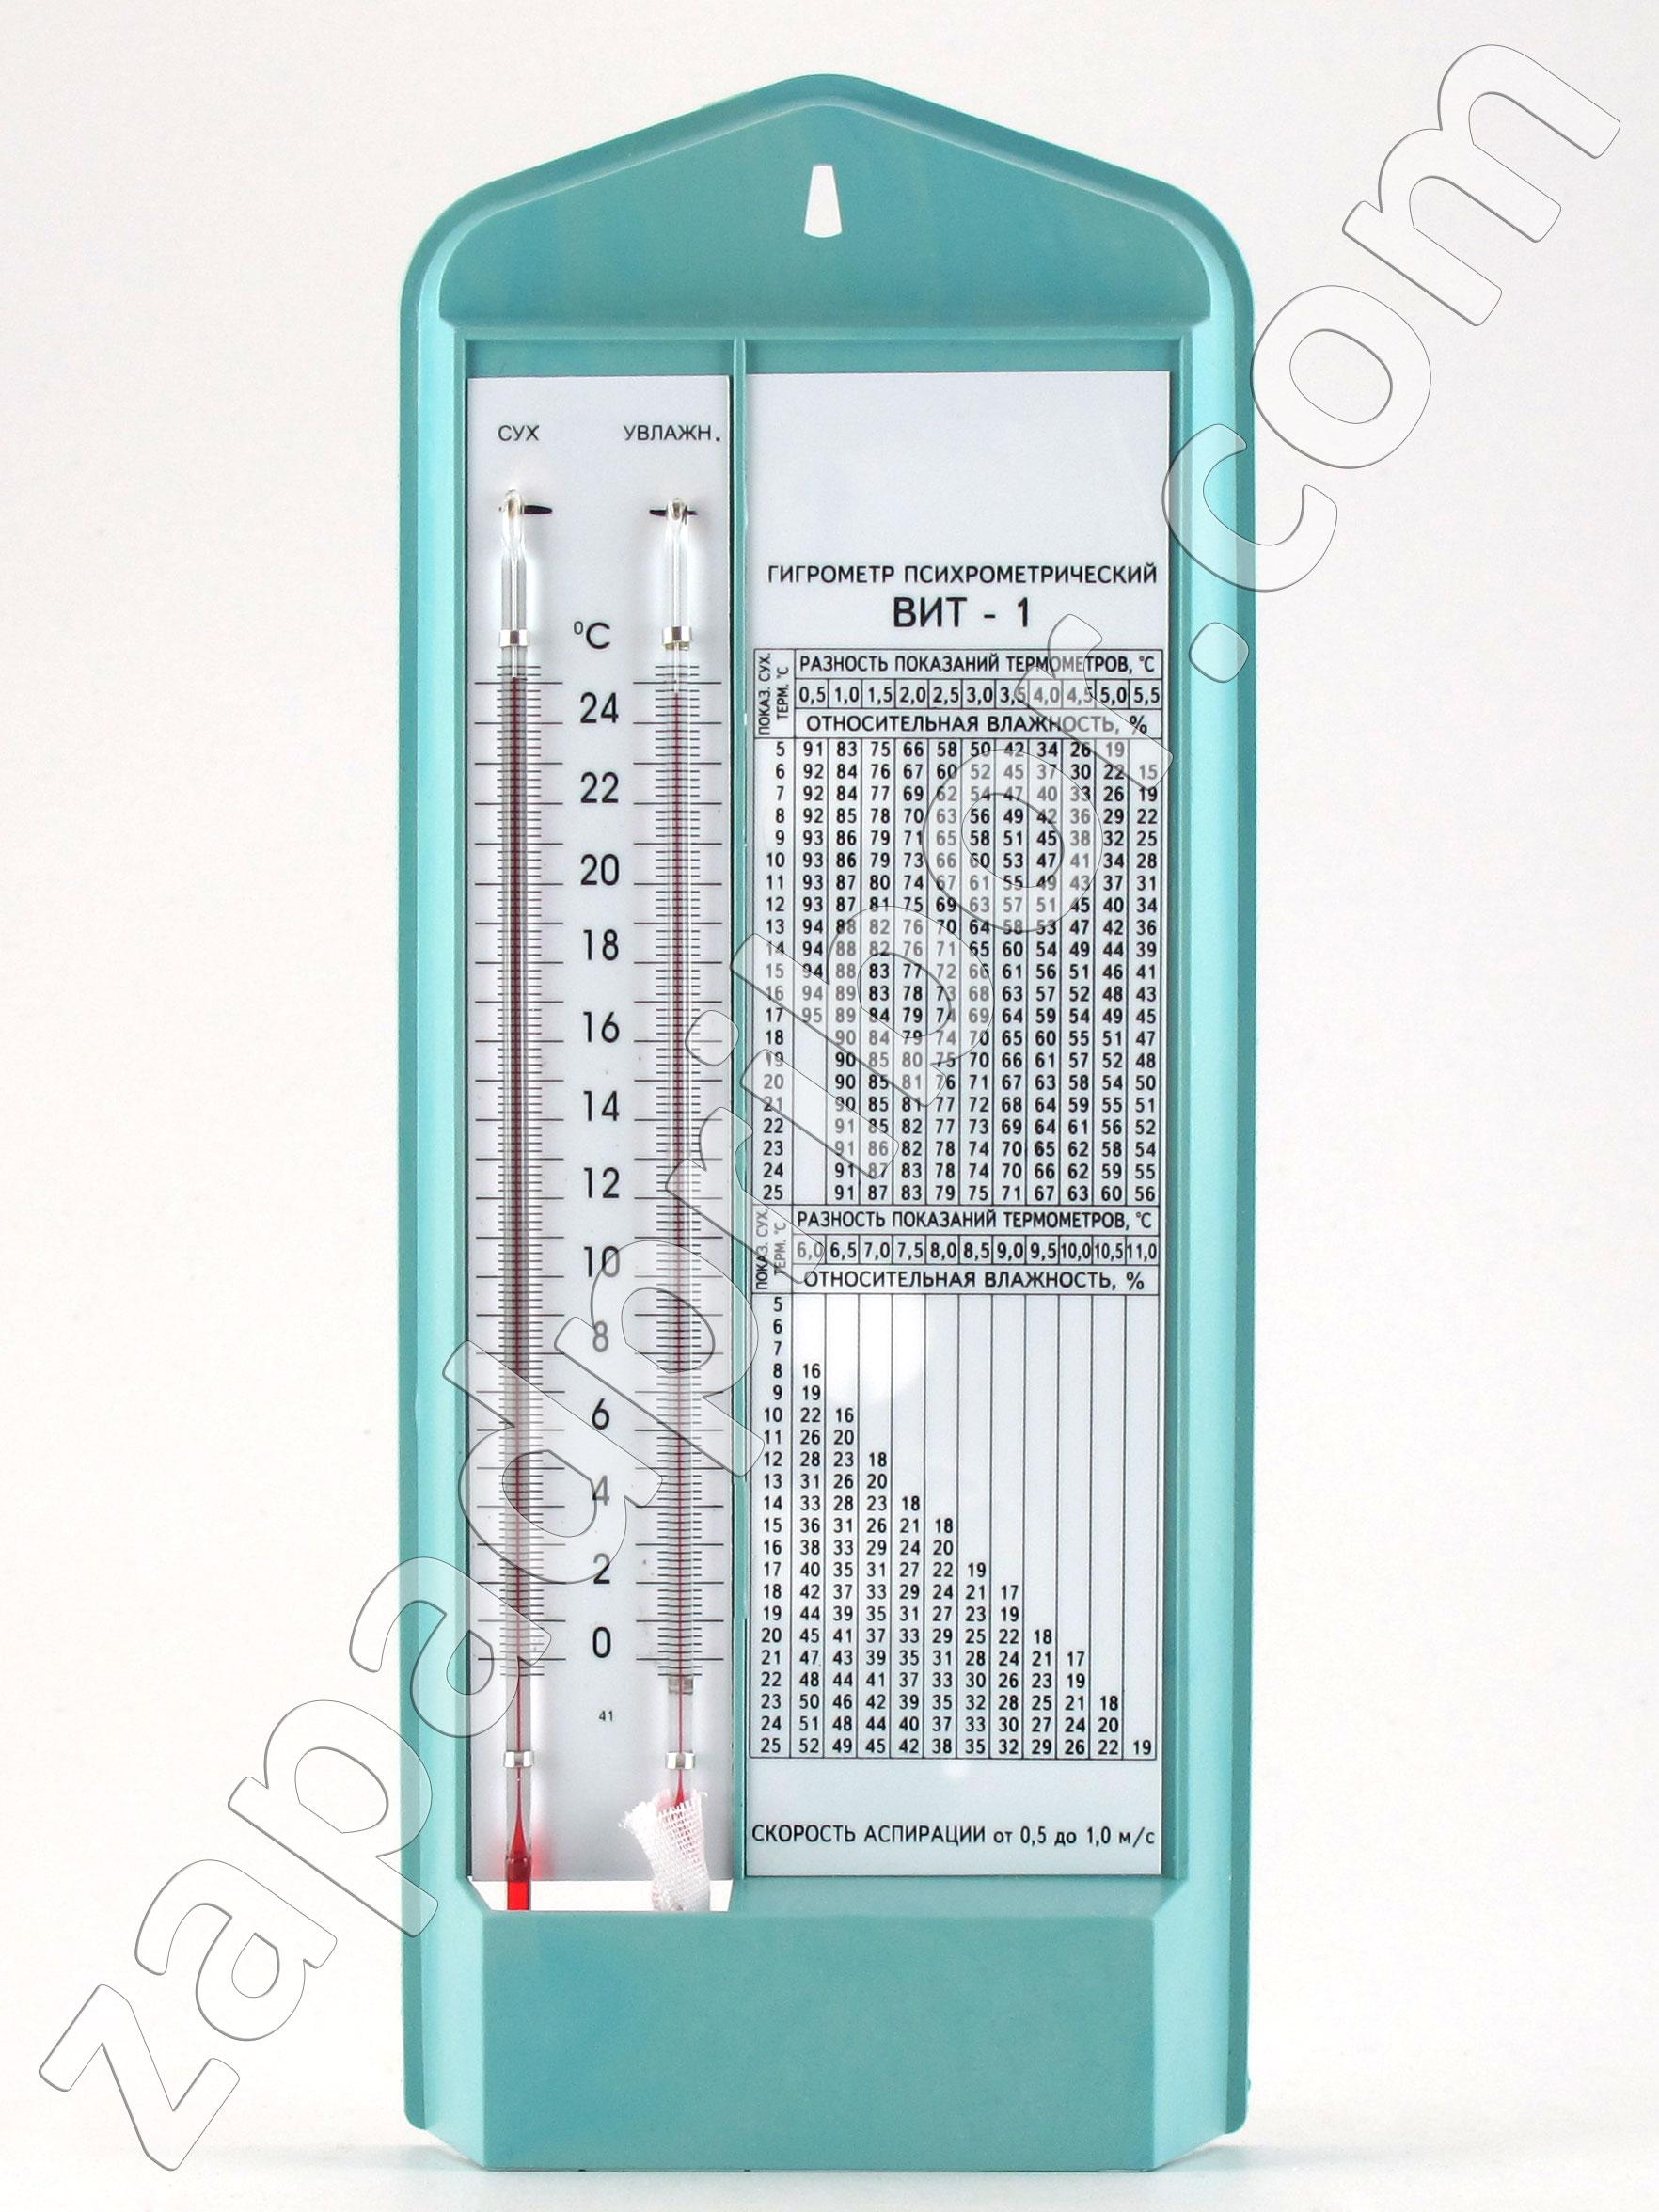 гигрометр вит-1 инструкция видео